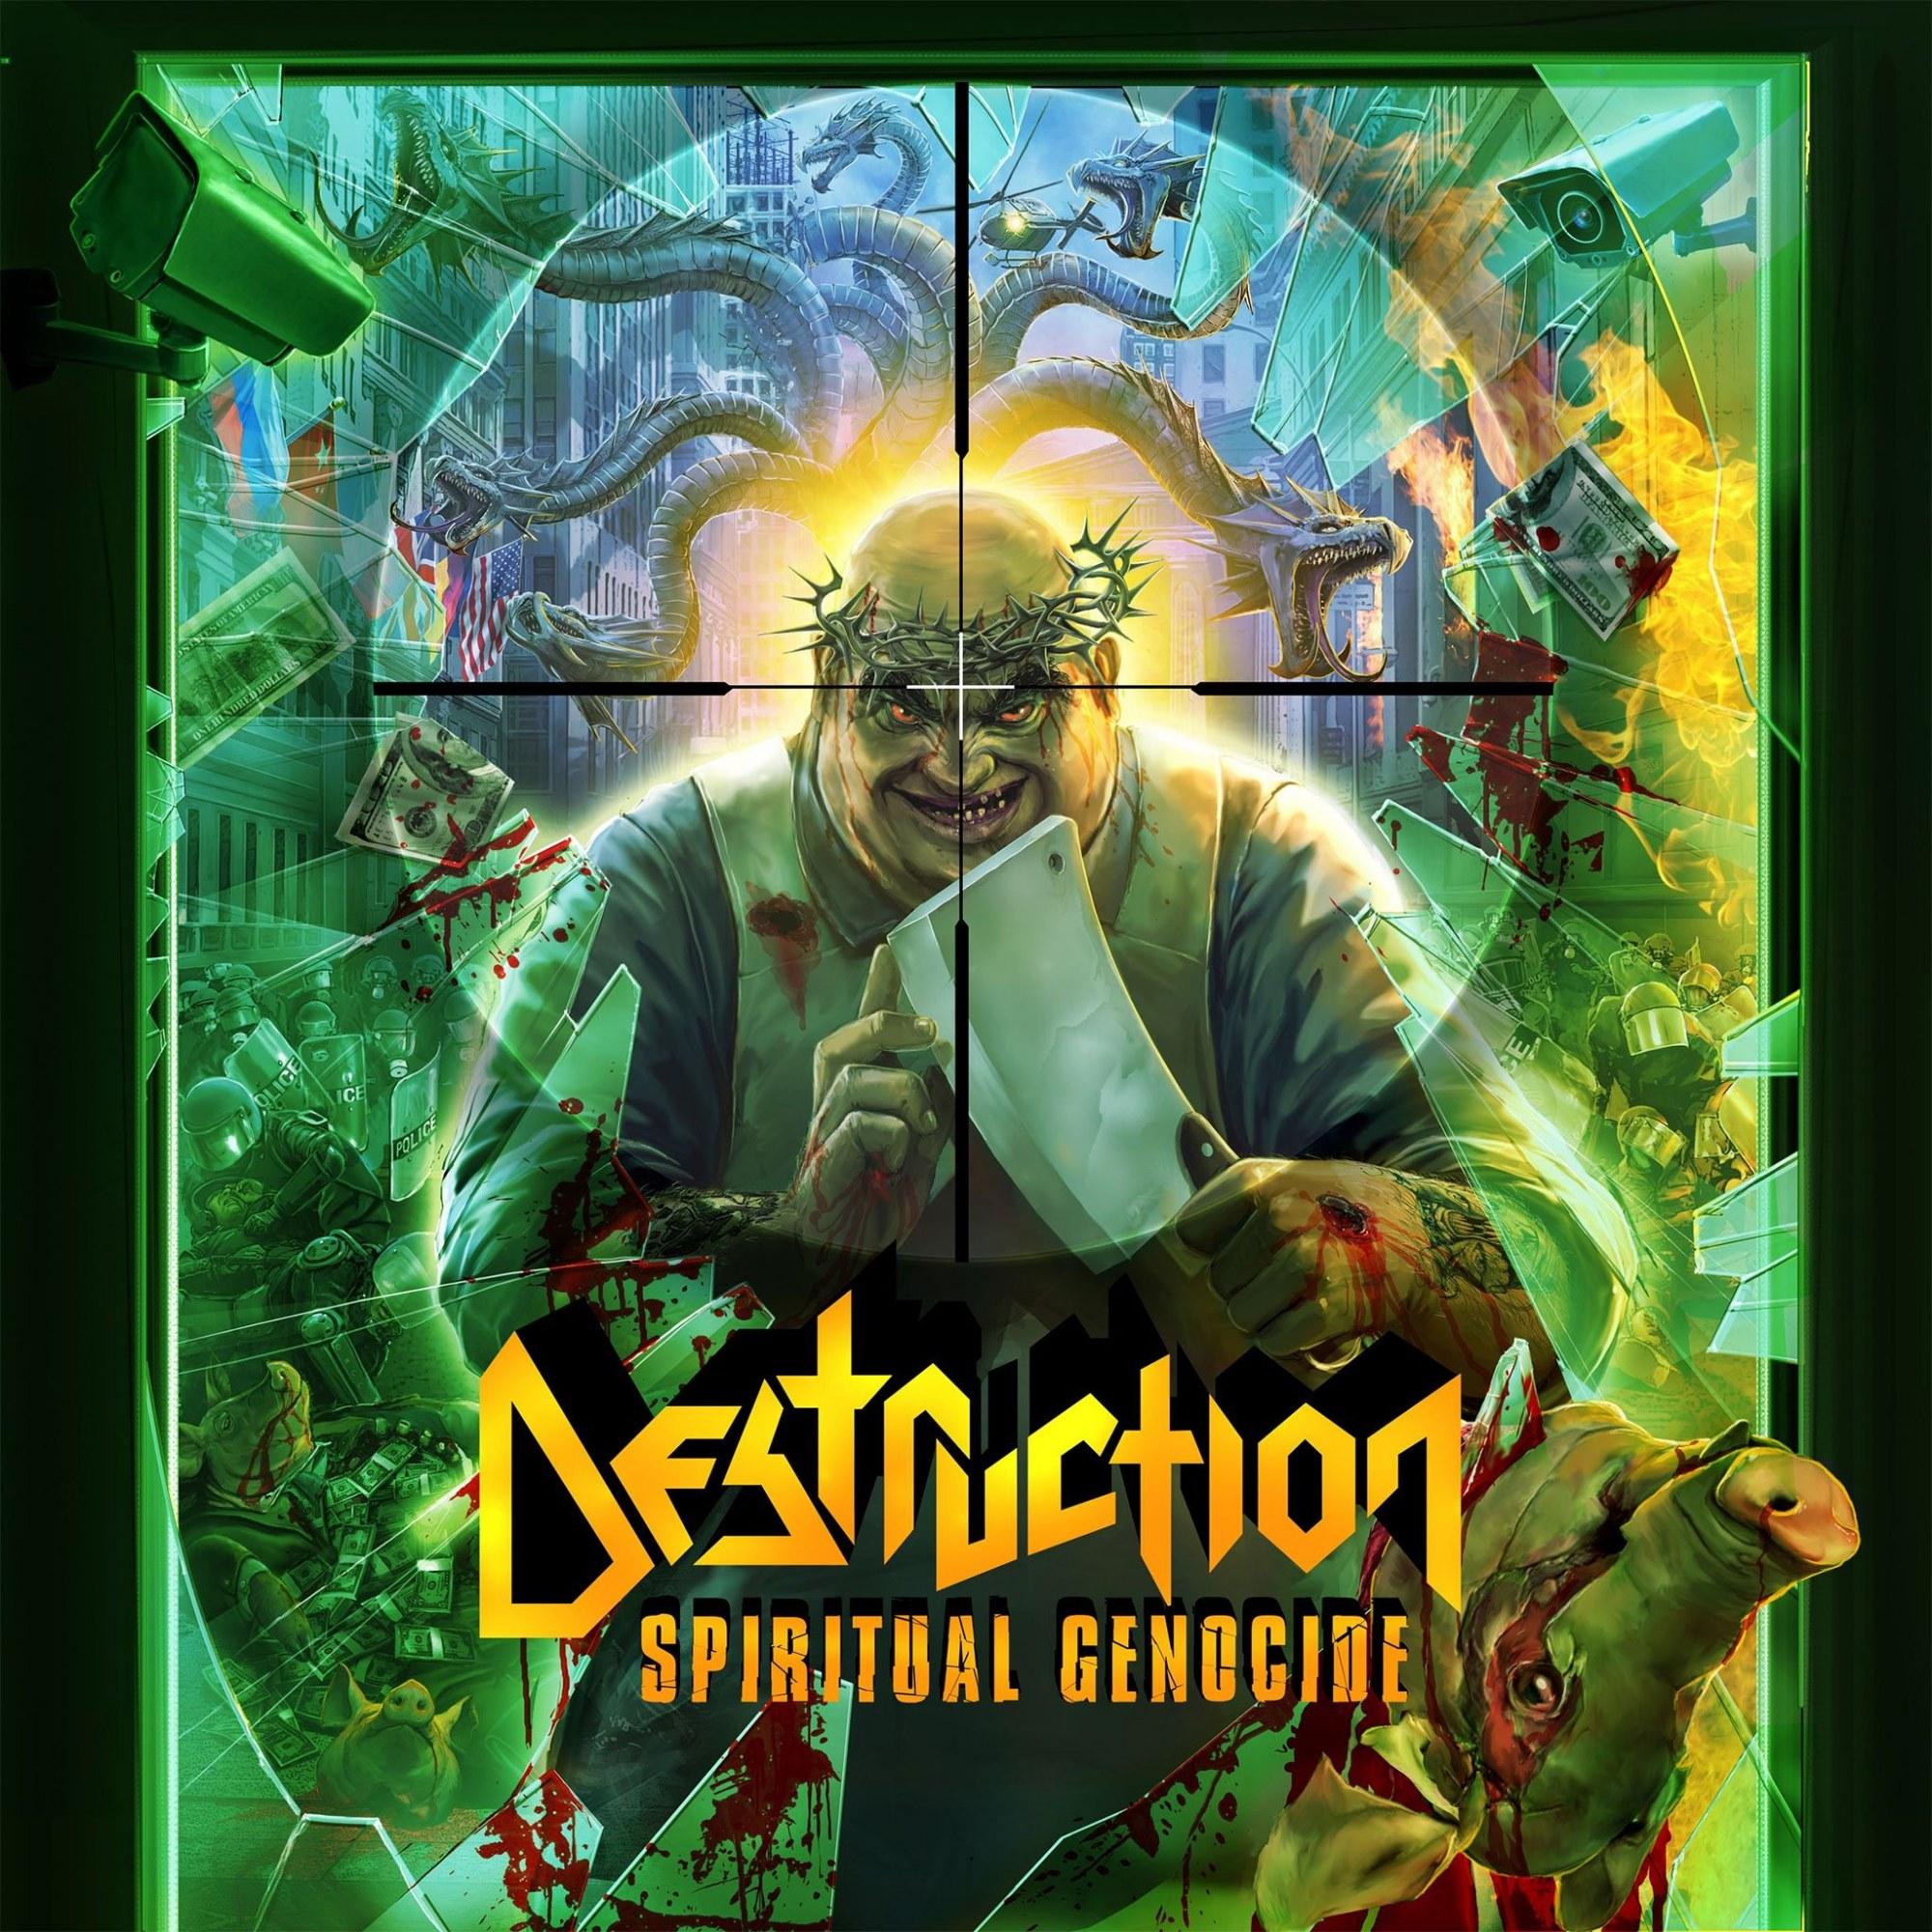 Review for Destruction - Spiritual Genocide